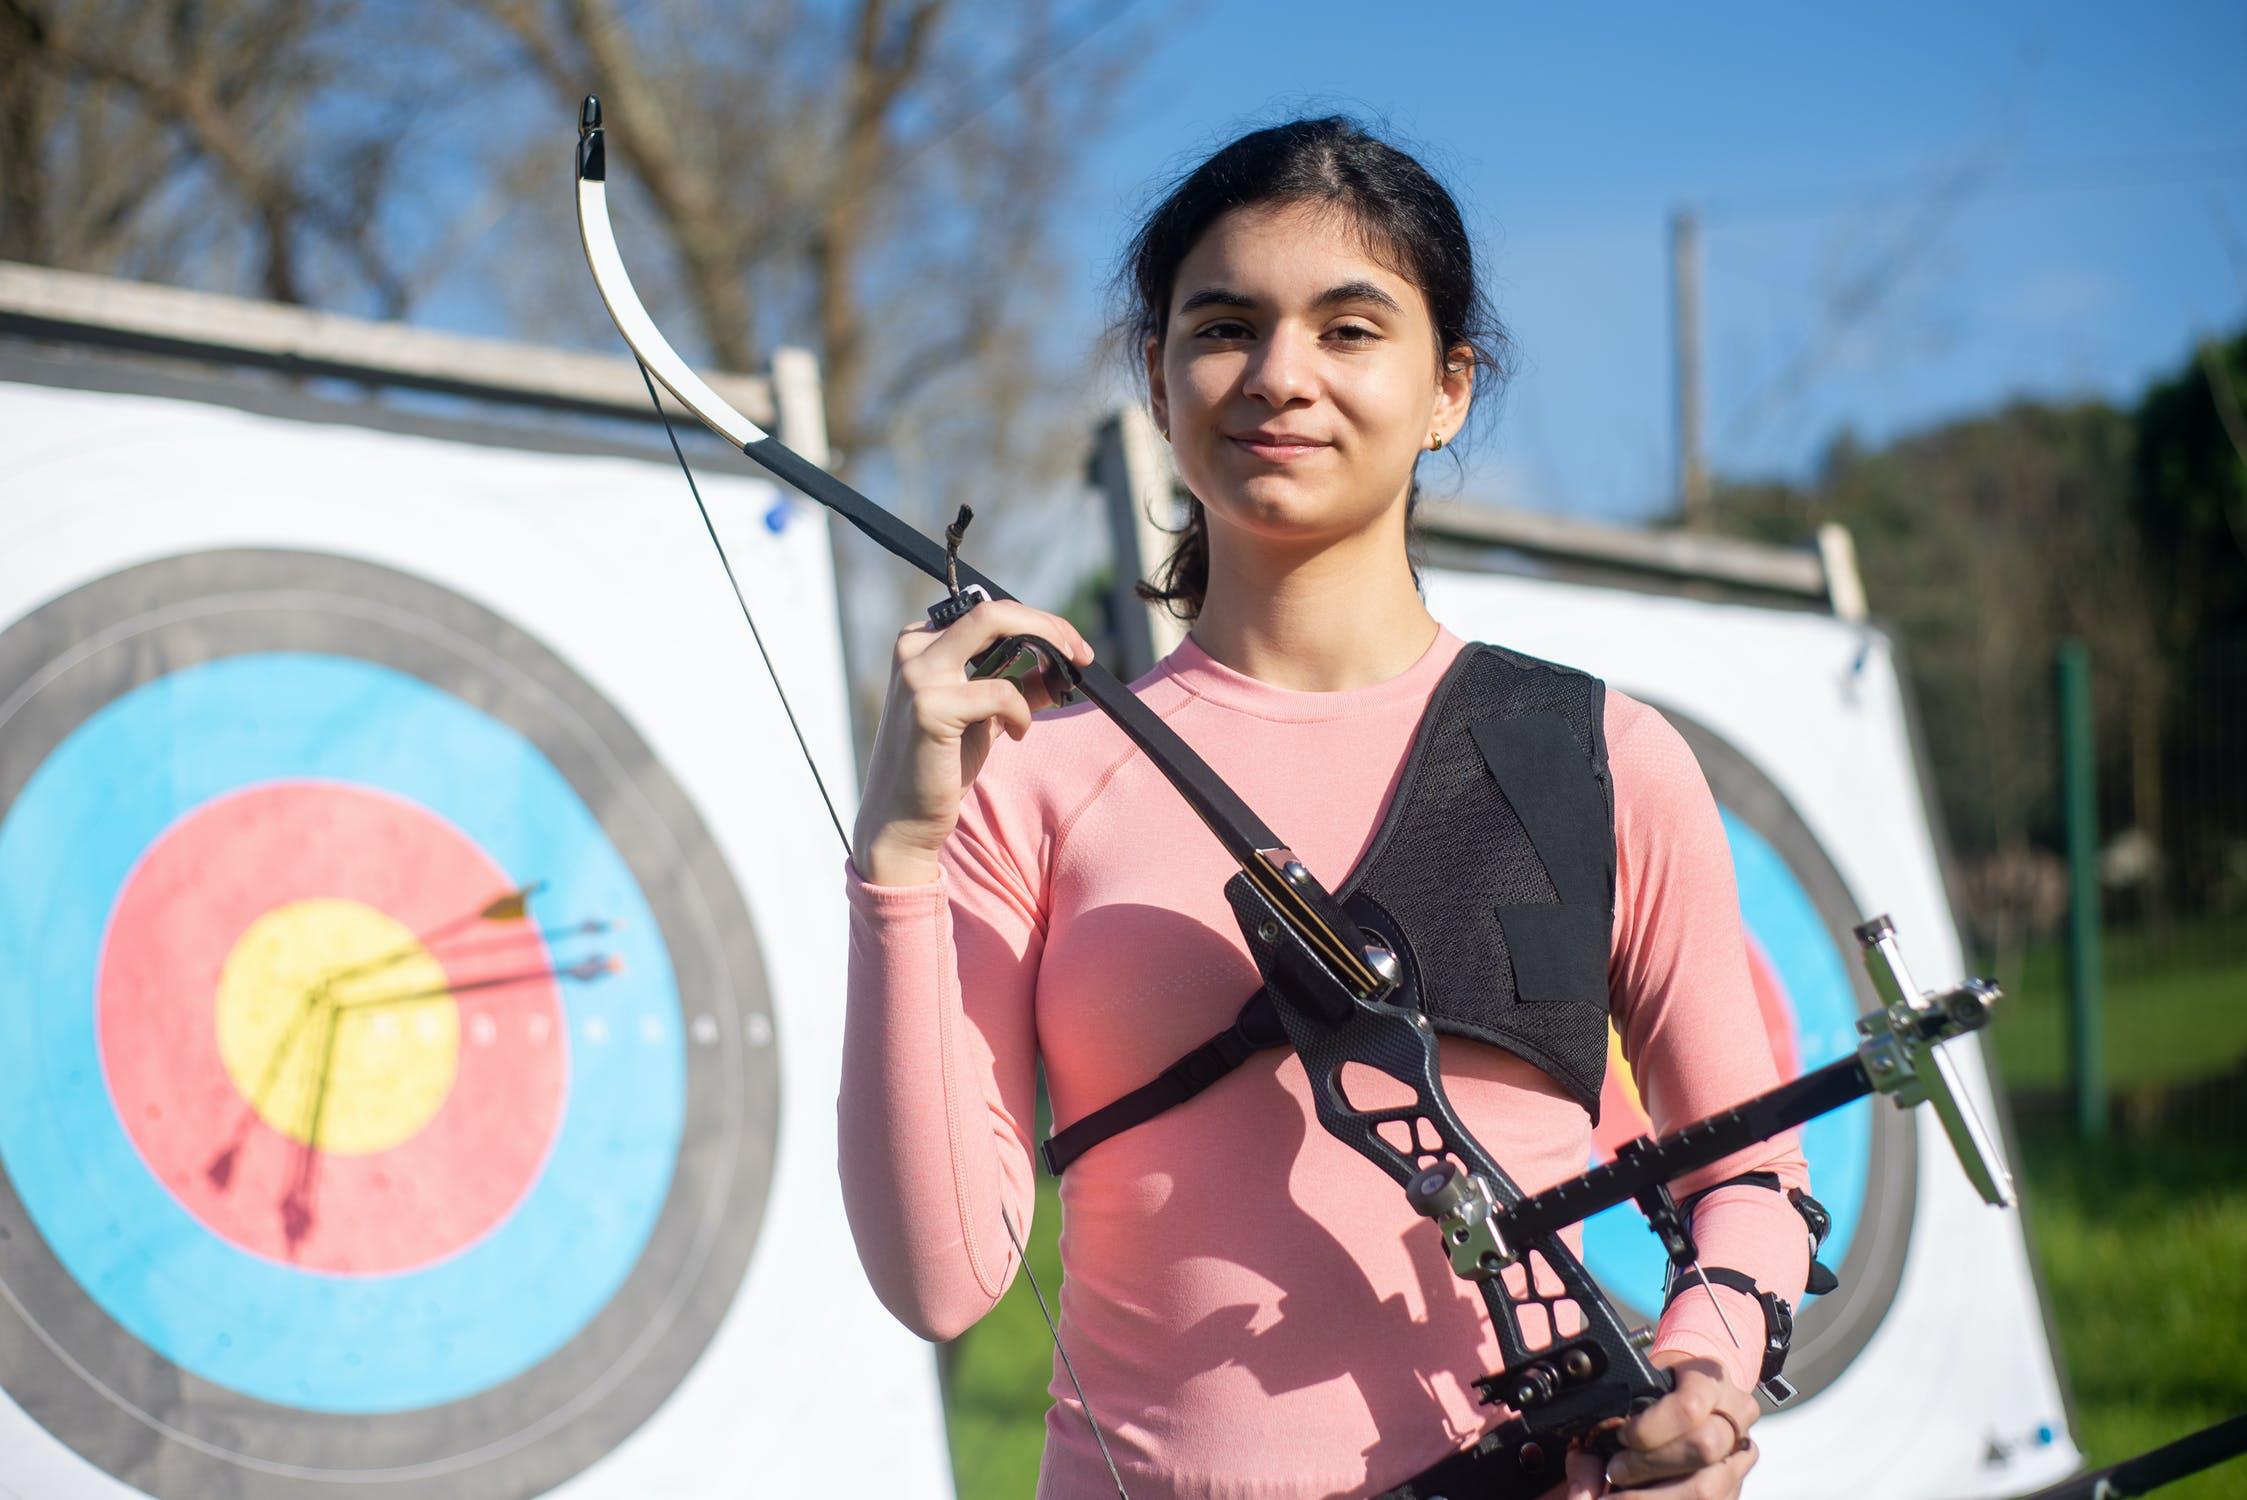 archery games, yescomusa, home improvement